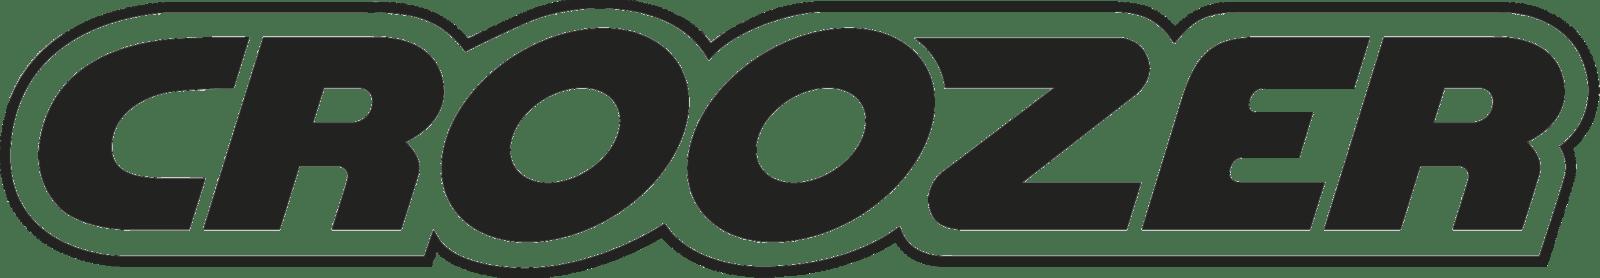 CRO Logo schwarz - Fahrrad-Anhänger